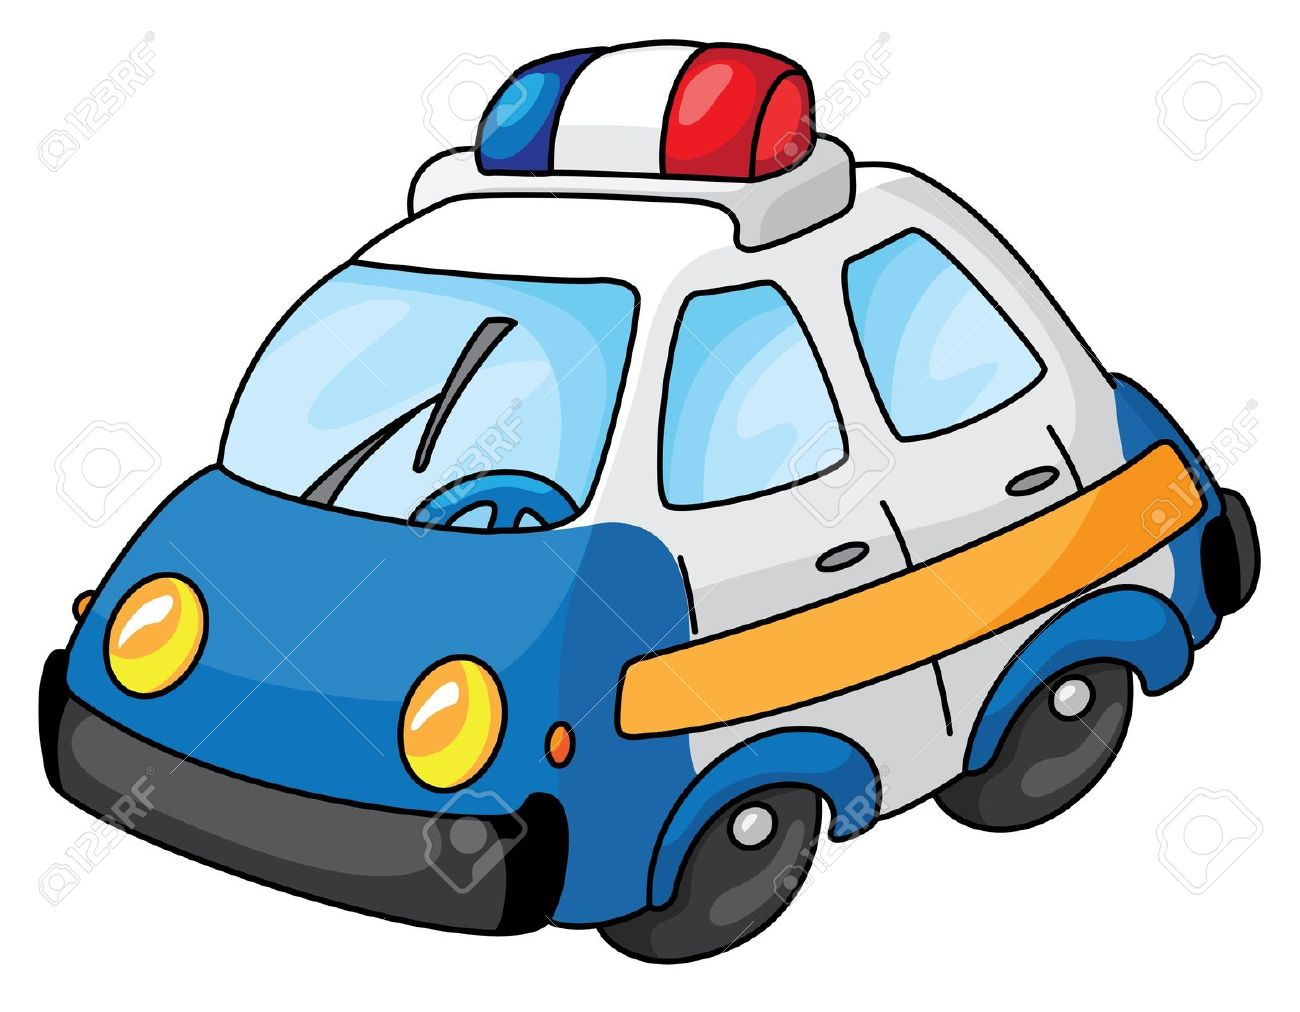 Police car cartoon clipart clipart free stock Blue police car clipart - ClipartFest clipart free stock